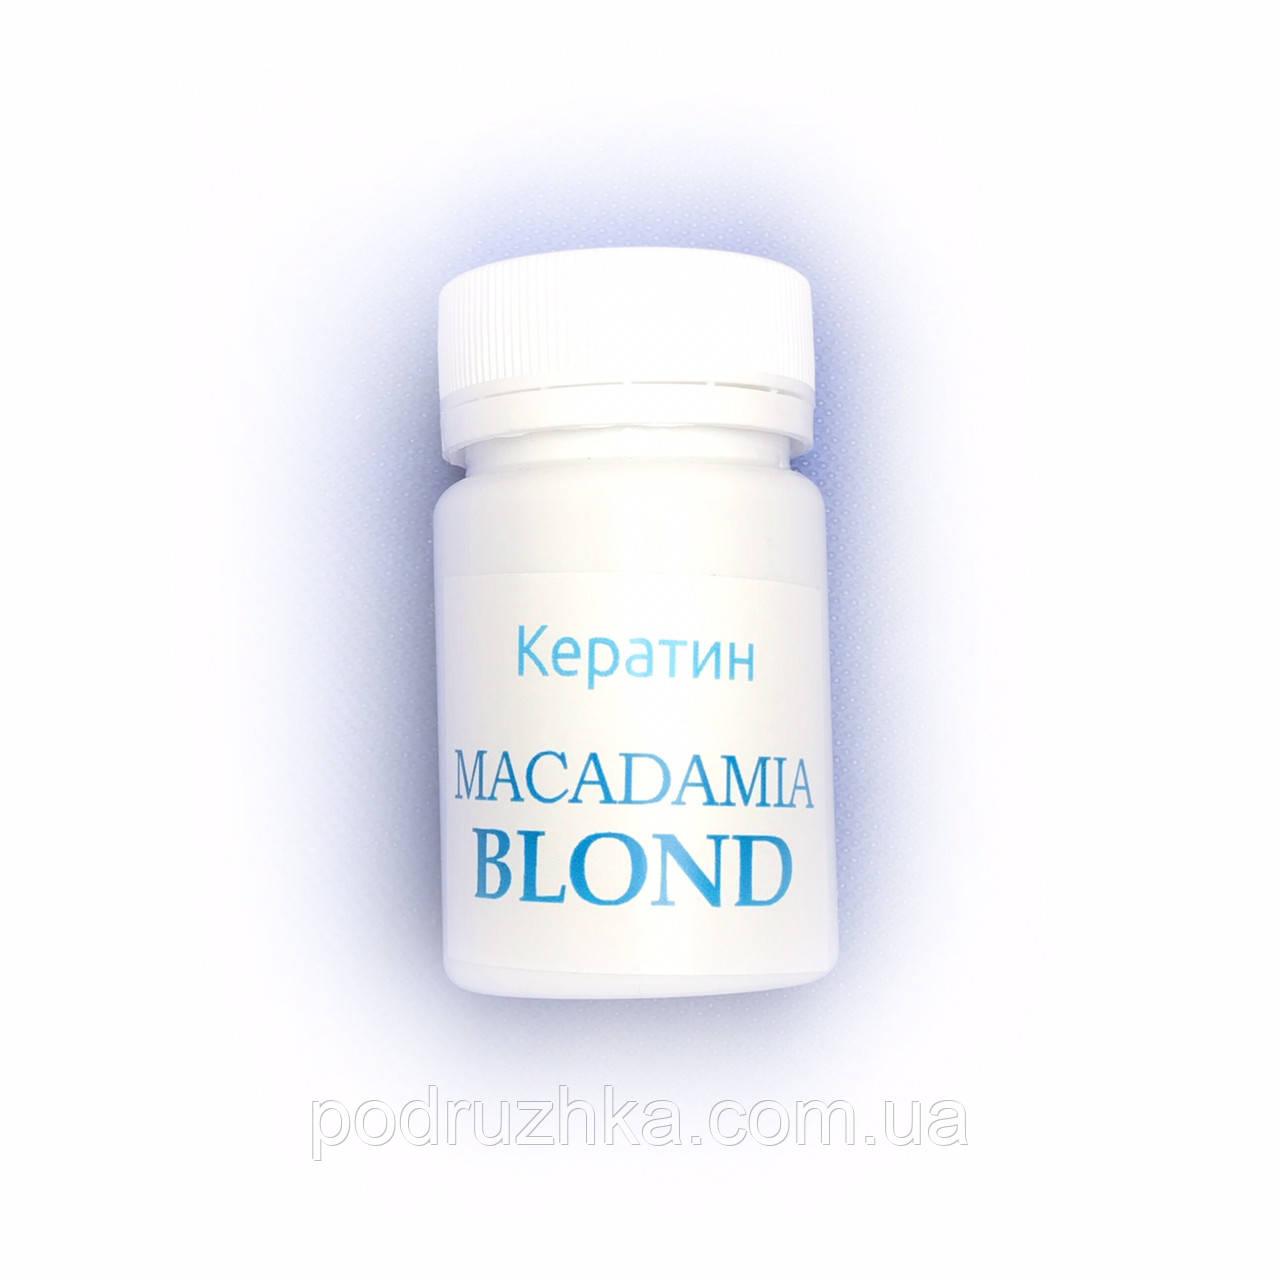 Кератин для волос Macadamia Ultimate Blond (шаг 2) 100 г